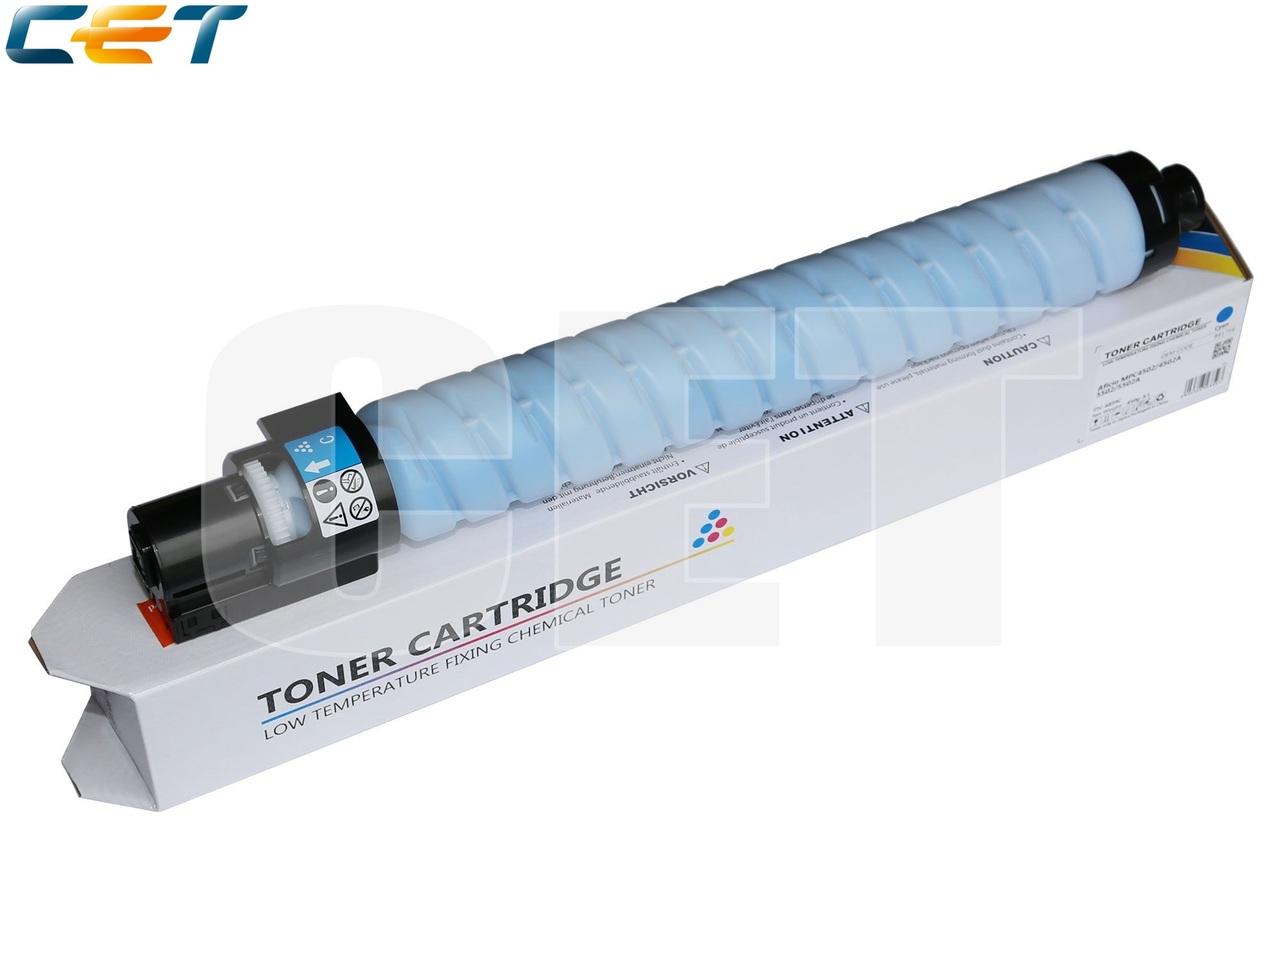 Тонер-картридж (CPT) 841686 для RICOH Aficio MPC4502/5502(CET) Cyan, (WW), 450г, 22500 стр., CET6859C